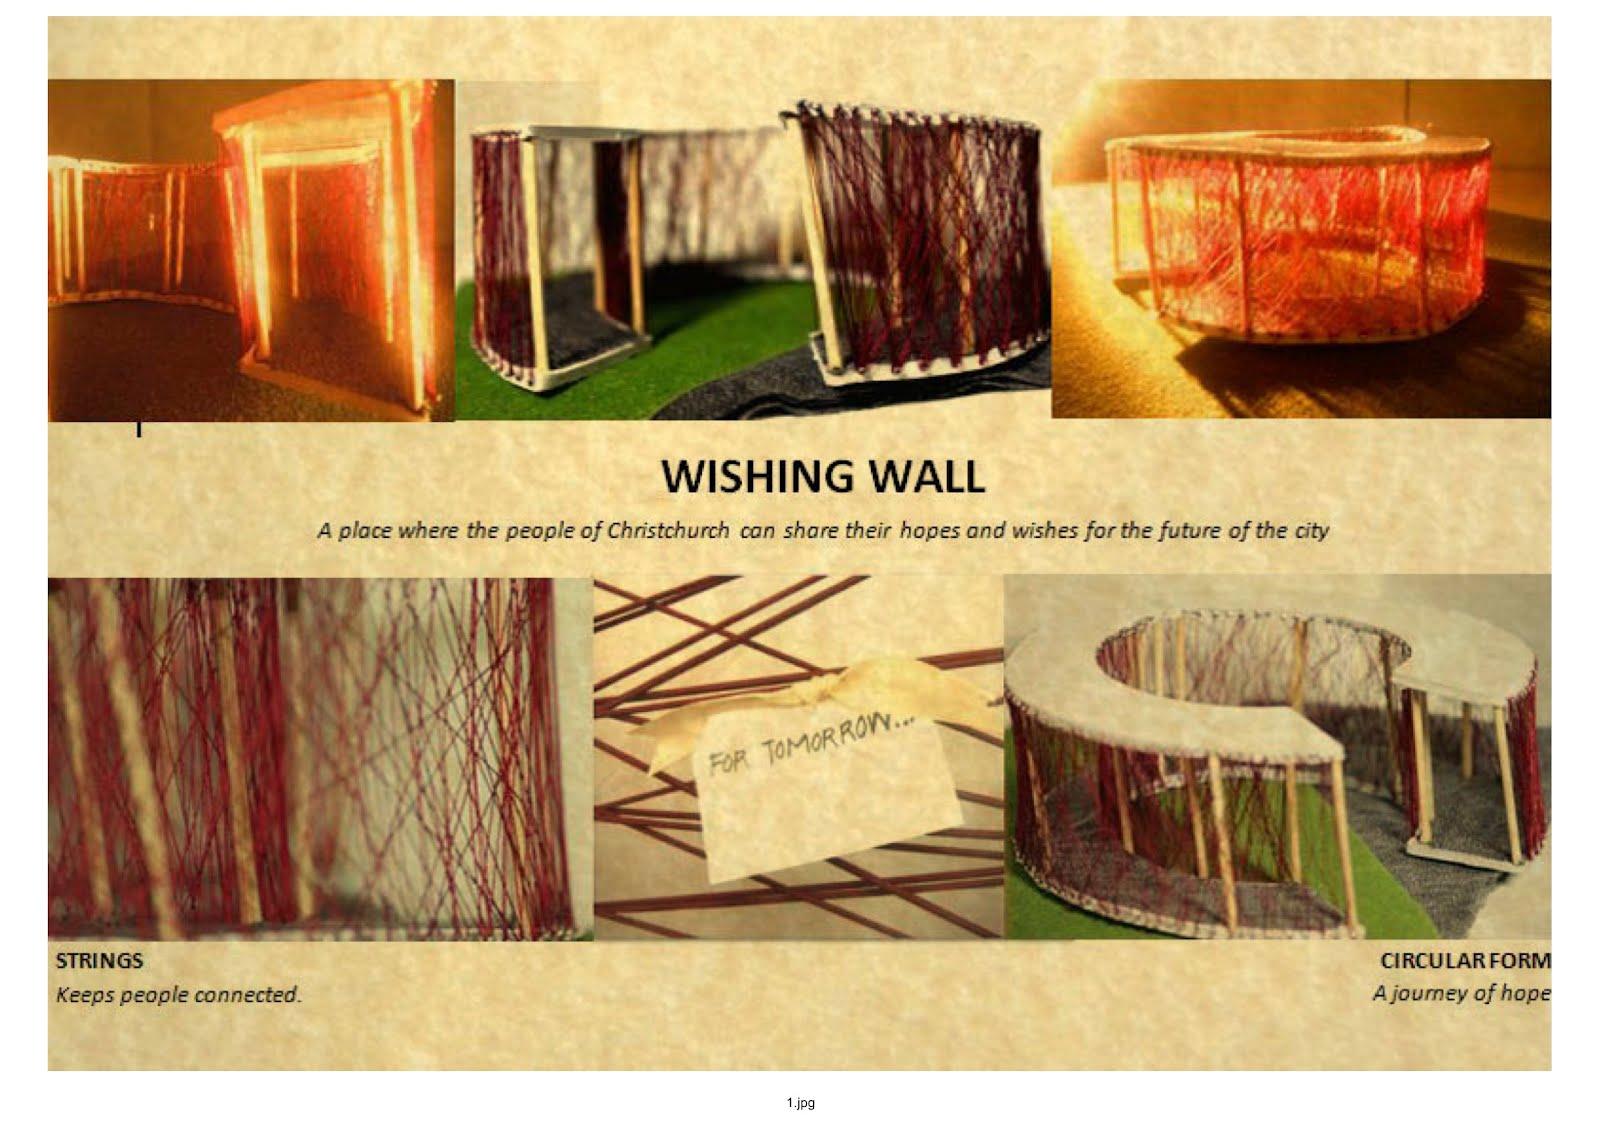 Wishing wall